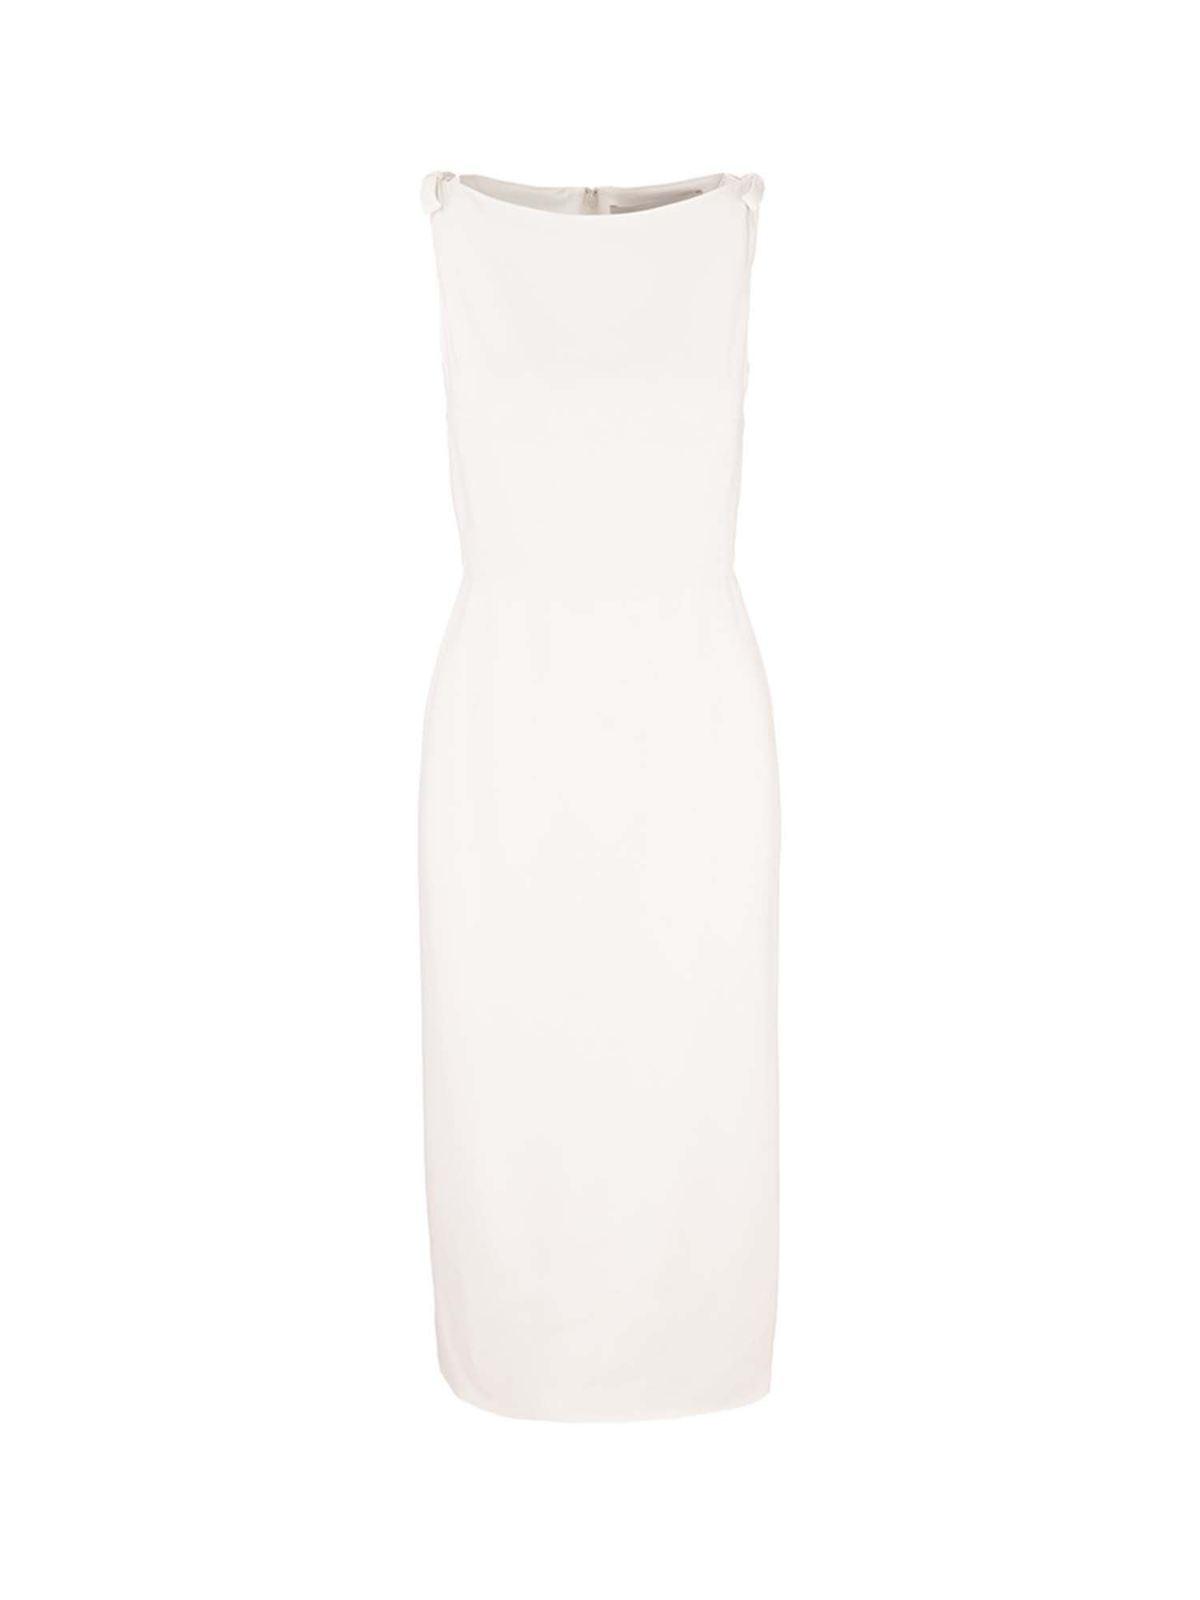 Valentino SHEATH DRESS IN WHITE